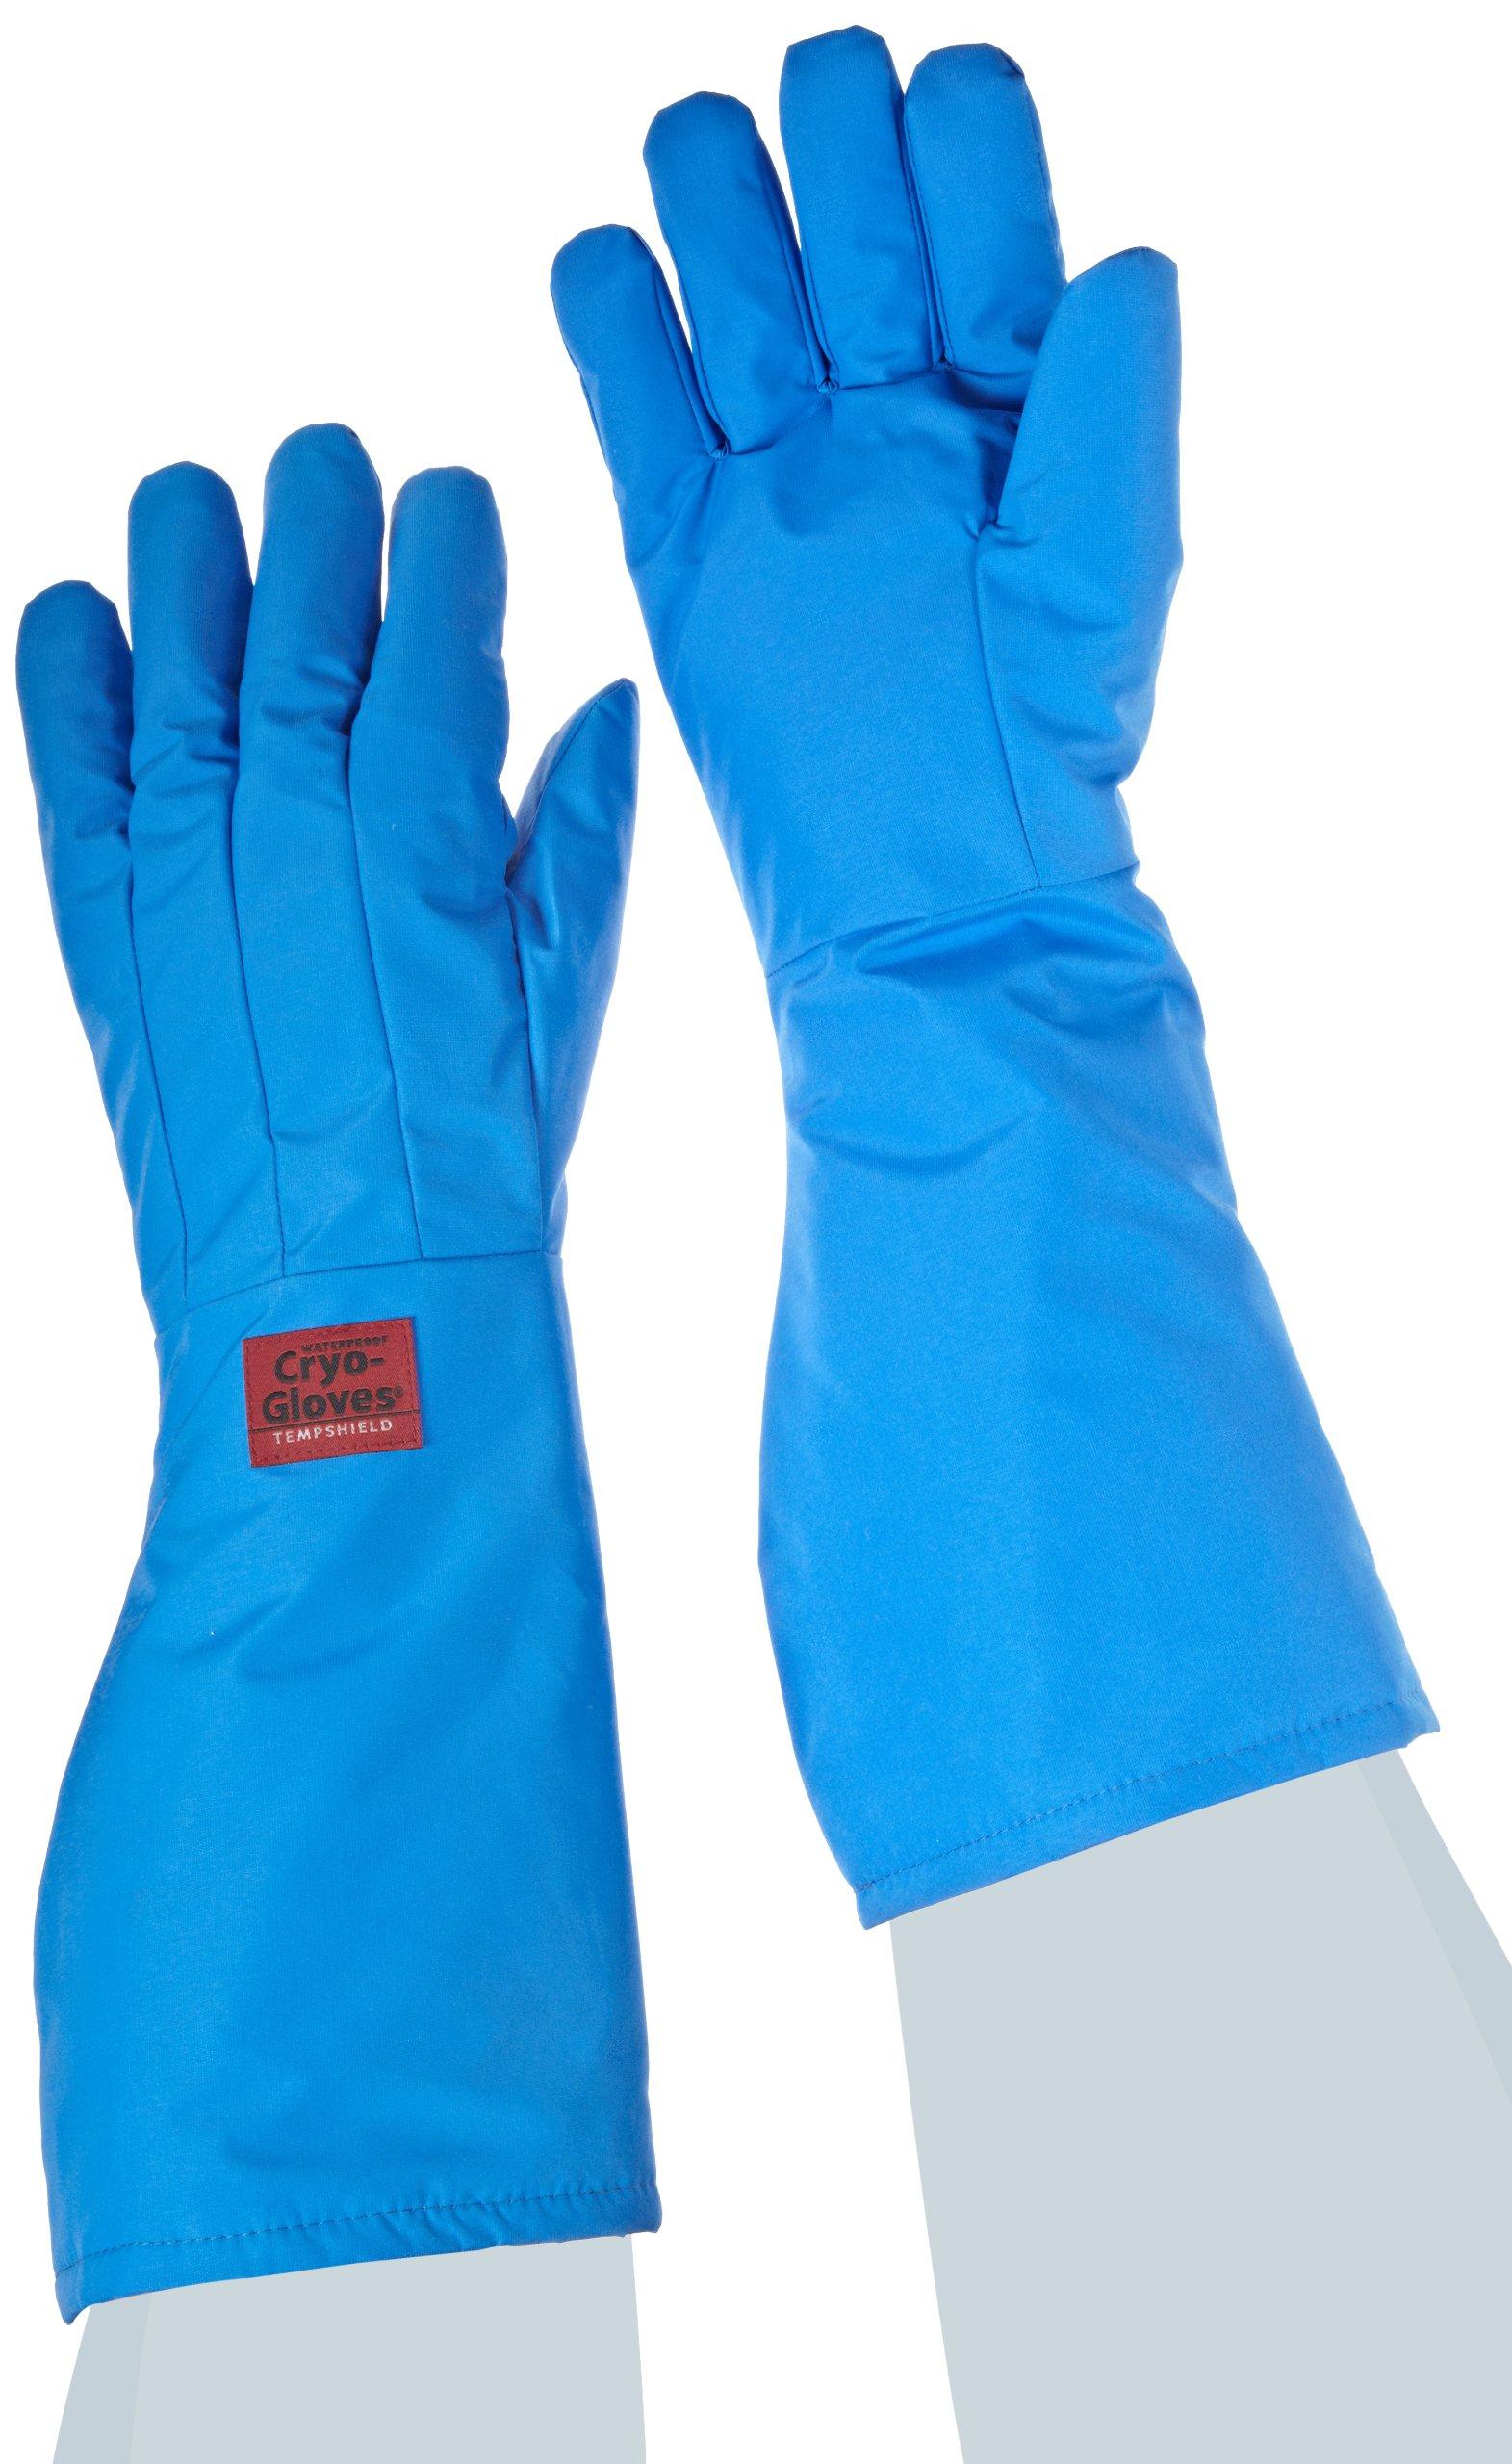 Waterproof Cryo-Gloves EBLWP Cryogenic Gloves, Elbow Length, Large